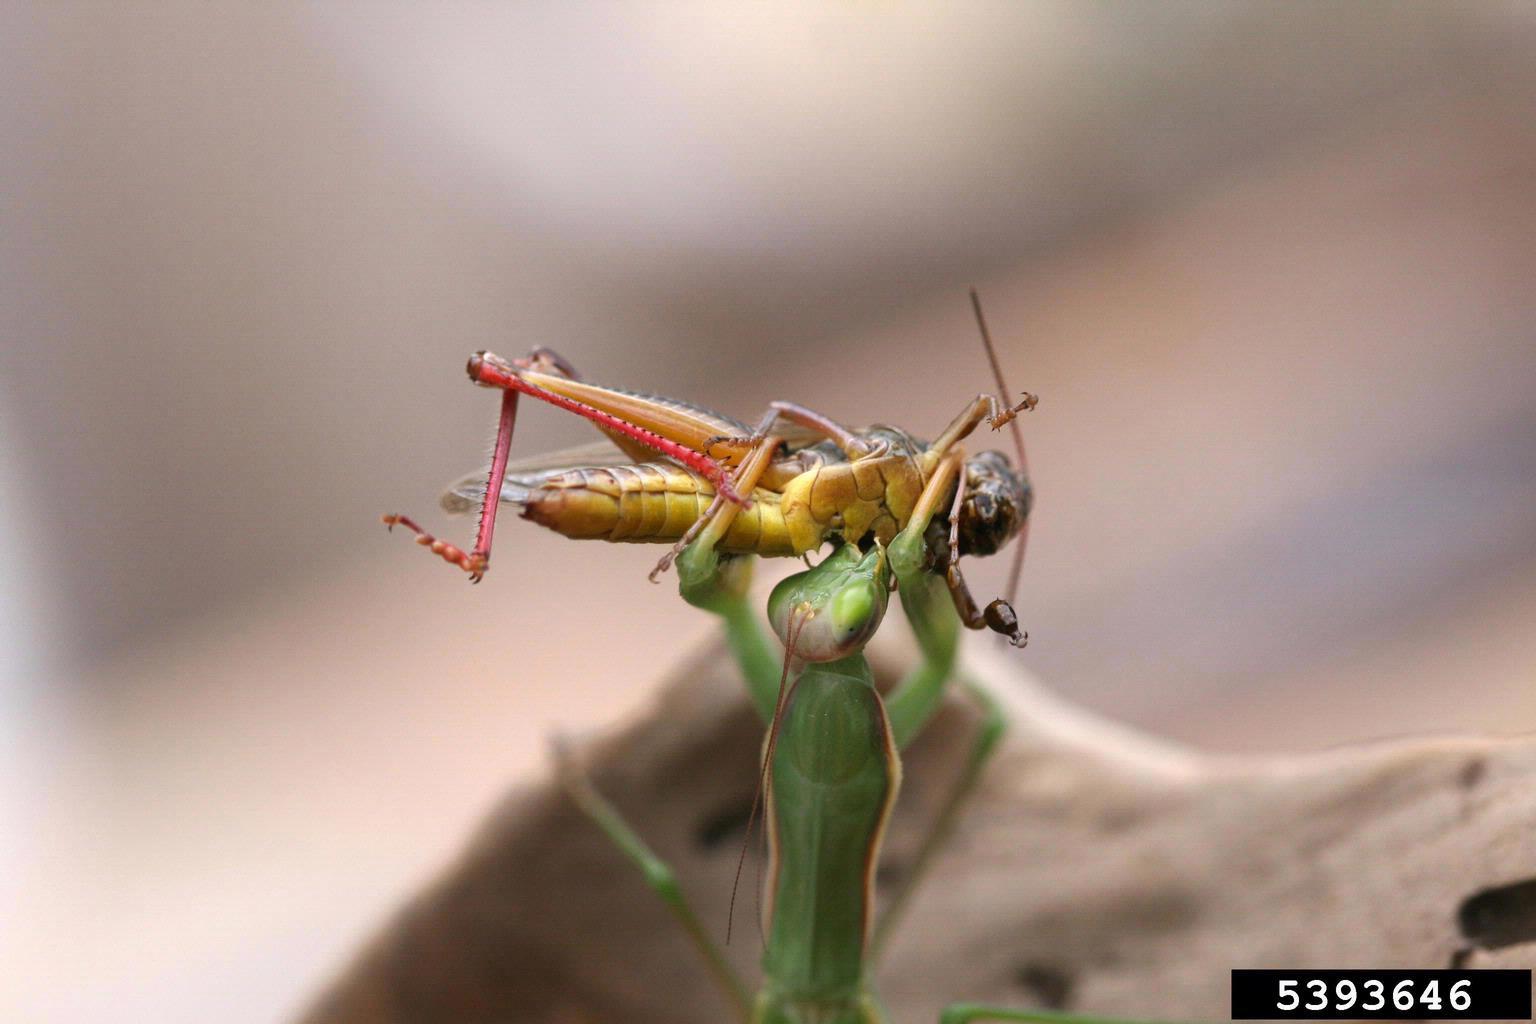 Pray For The Prey Of The Praying Mantis Maryland Invasive